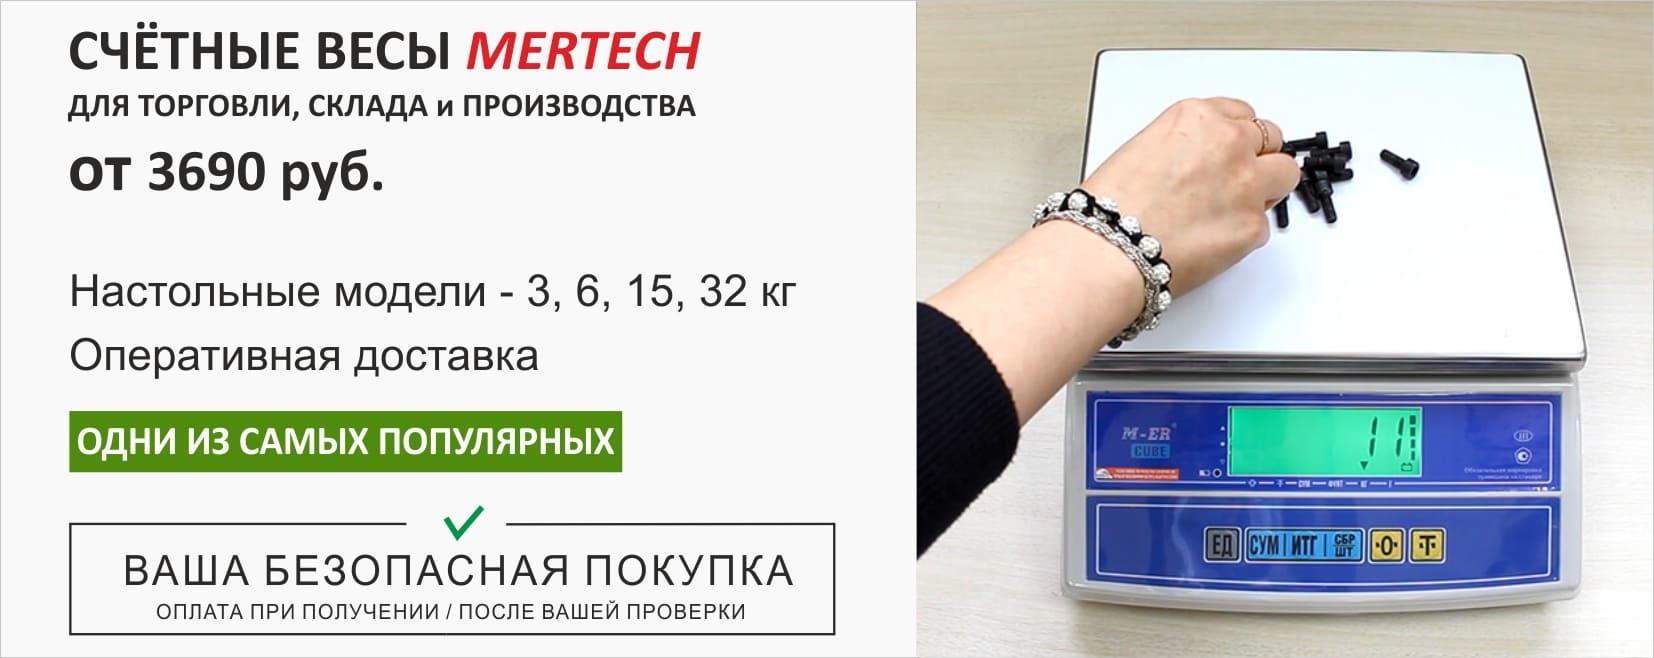 Весы счётные Mertech